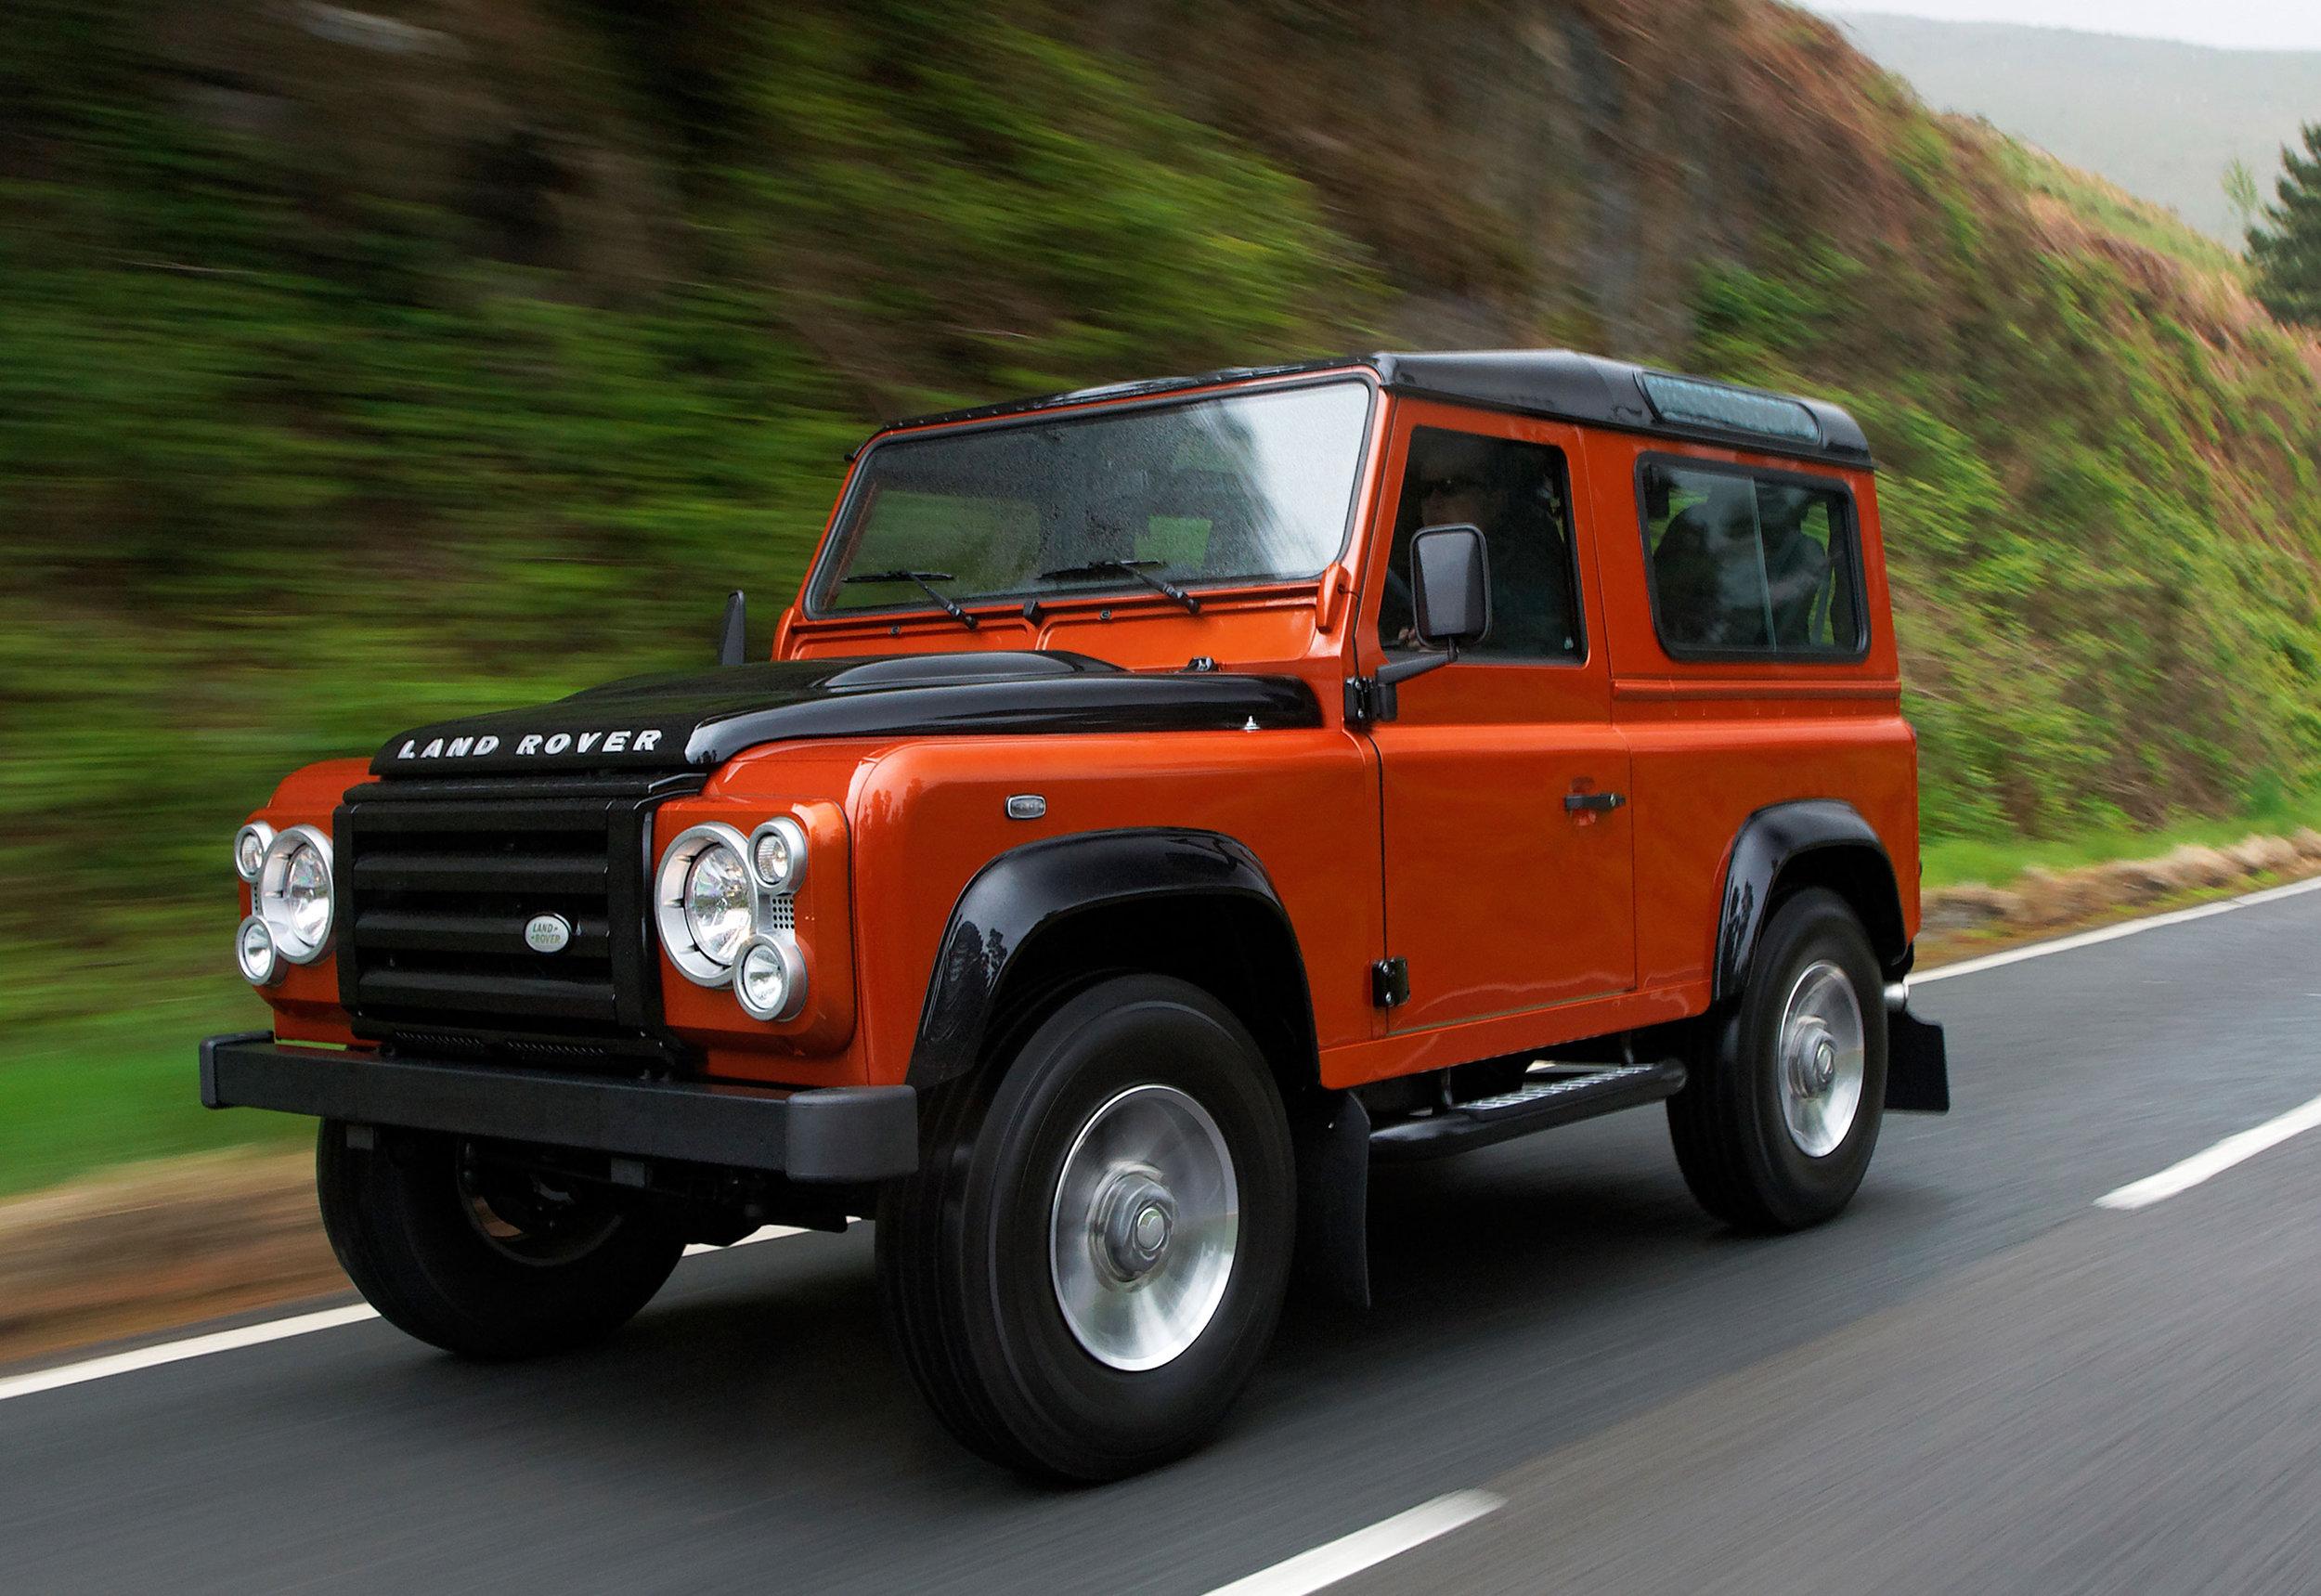 Land Rover Defender 09.jpg